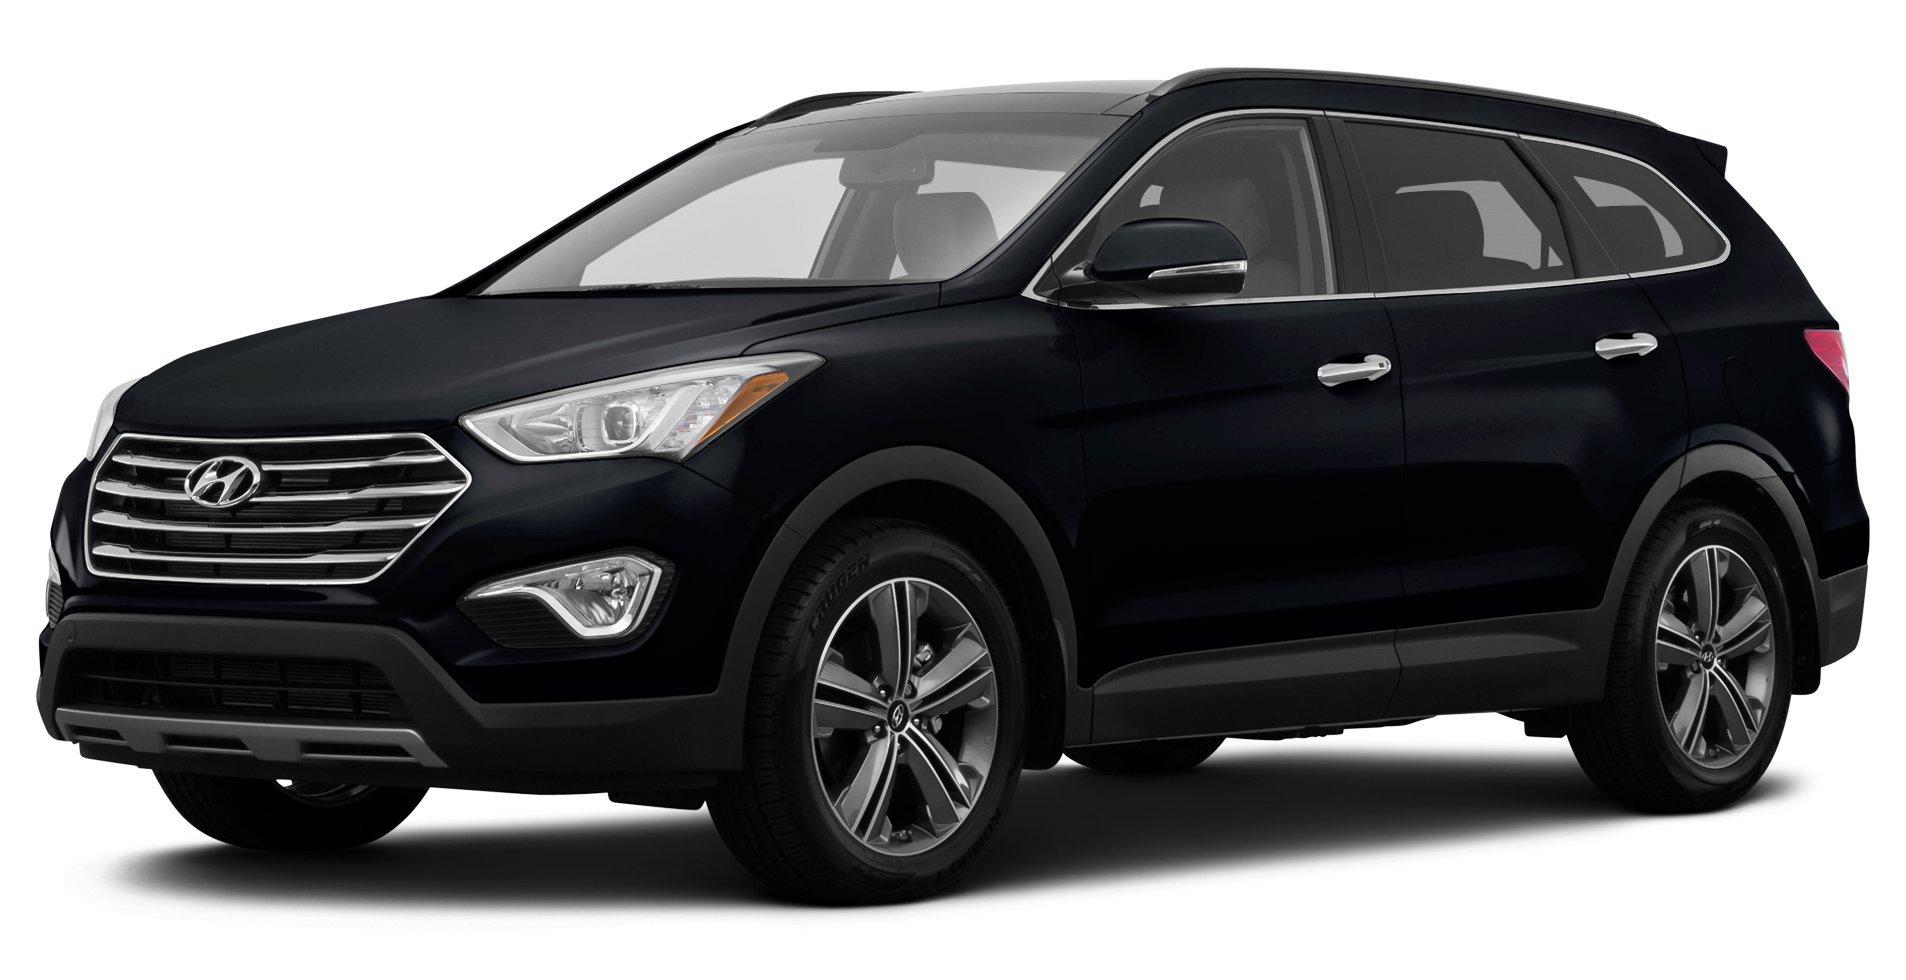 2016 Hyundai Santa Fe >> Amazon Com 2016 Hyundai Santa Fe Reviews Images And Specs Vehicles